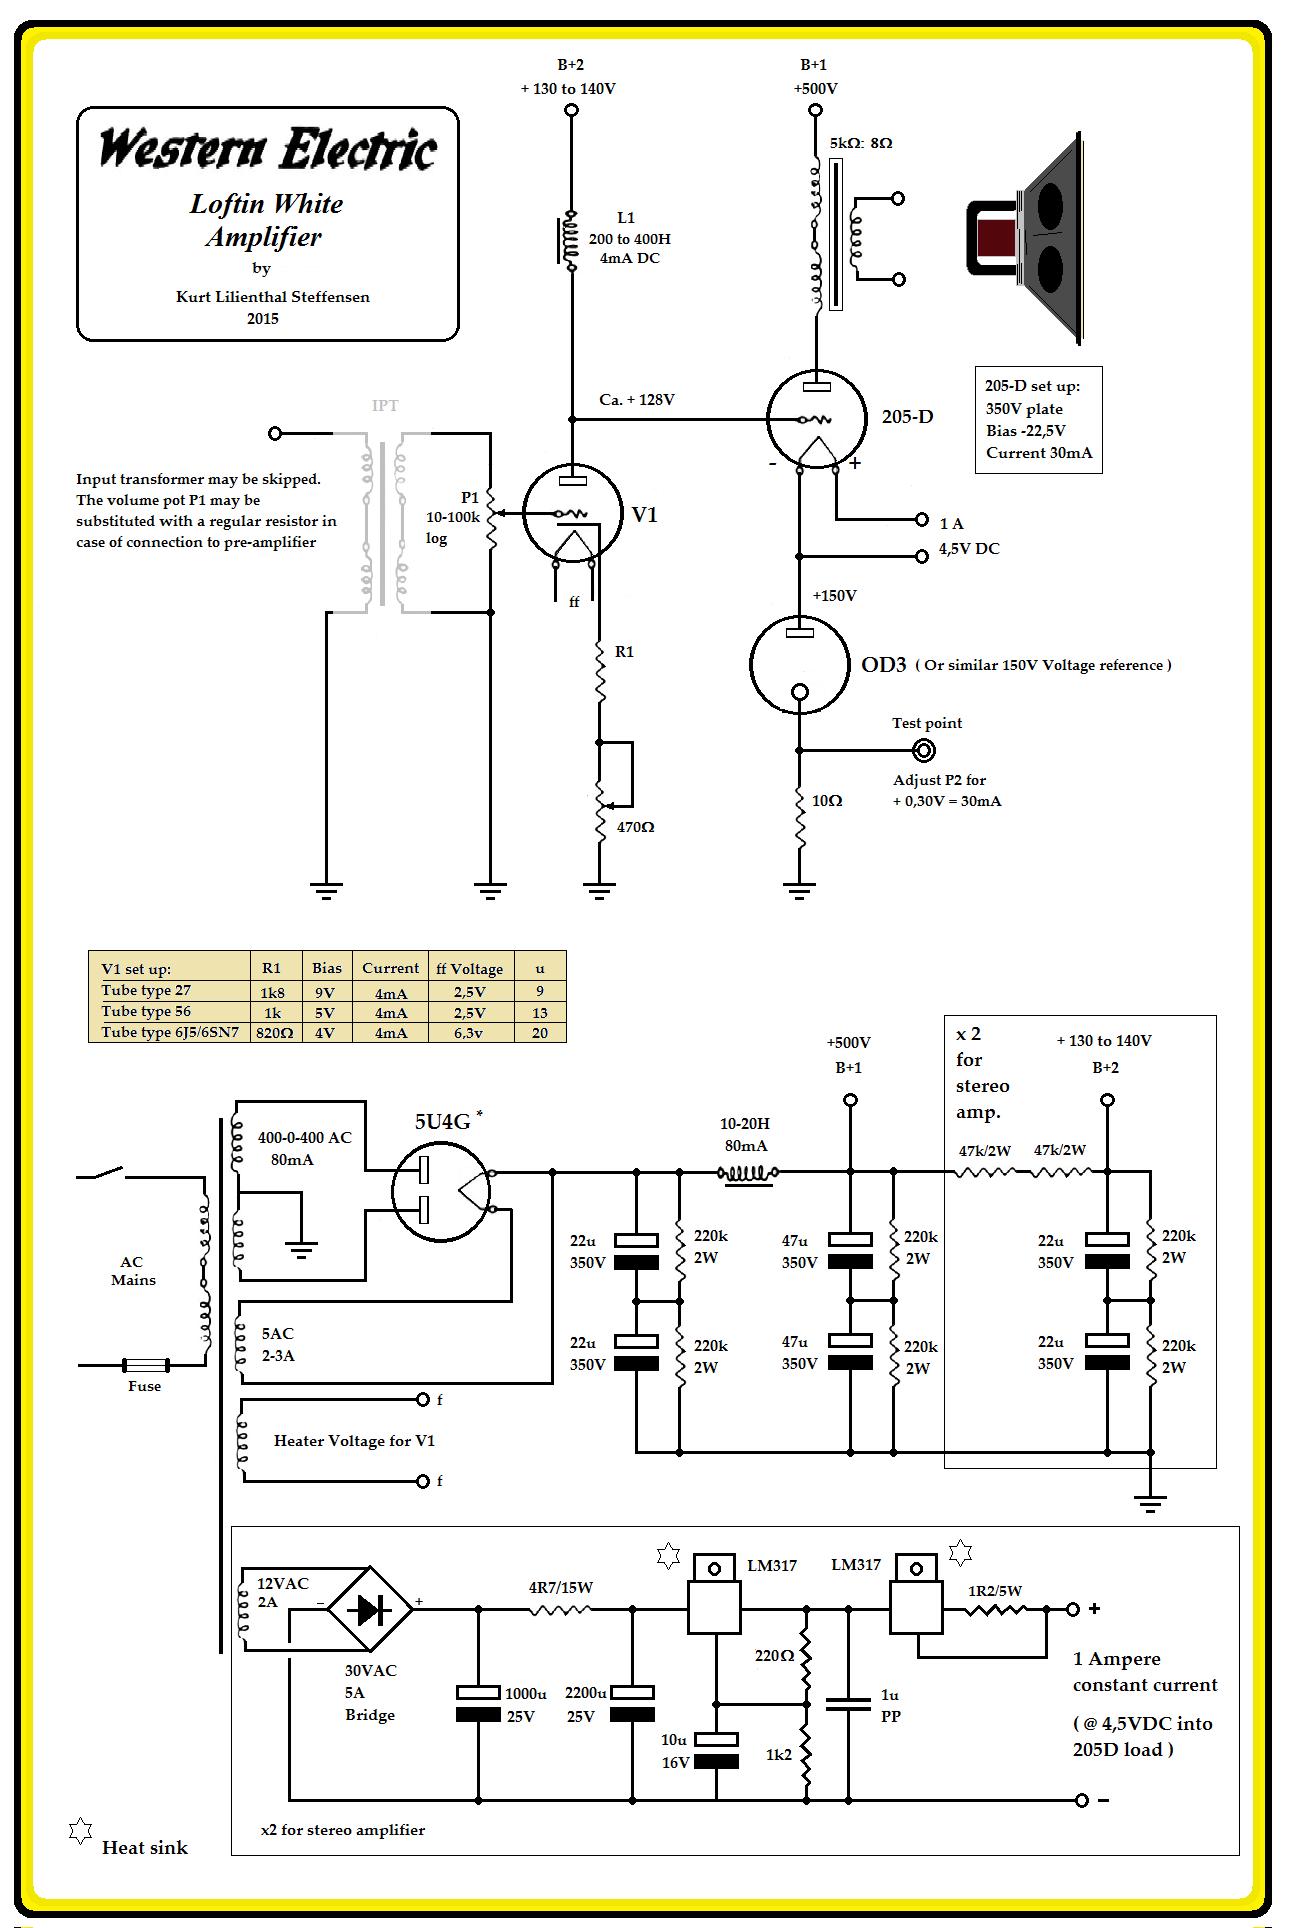 welwra lilienthal amplifier car audio amplifier speaker amplifier dc circuit circuit diagram [ 1296 x 1928 Pixel ]